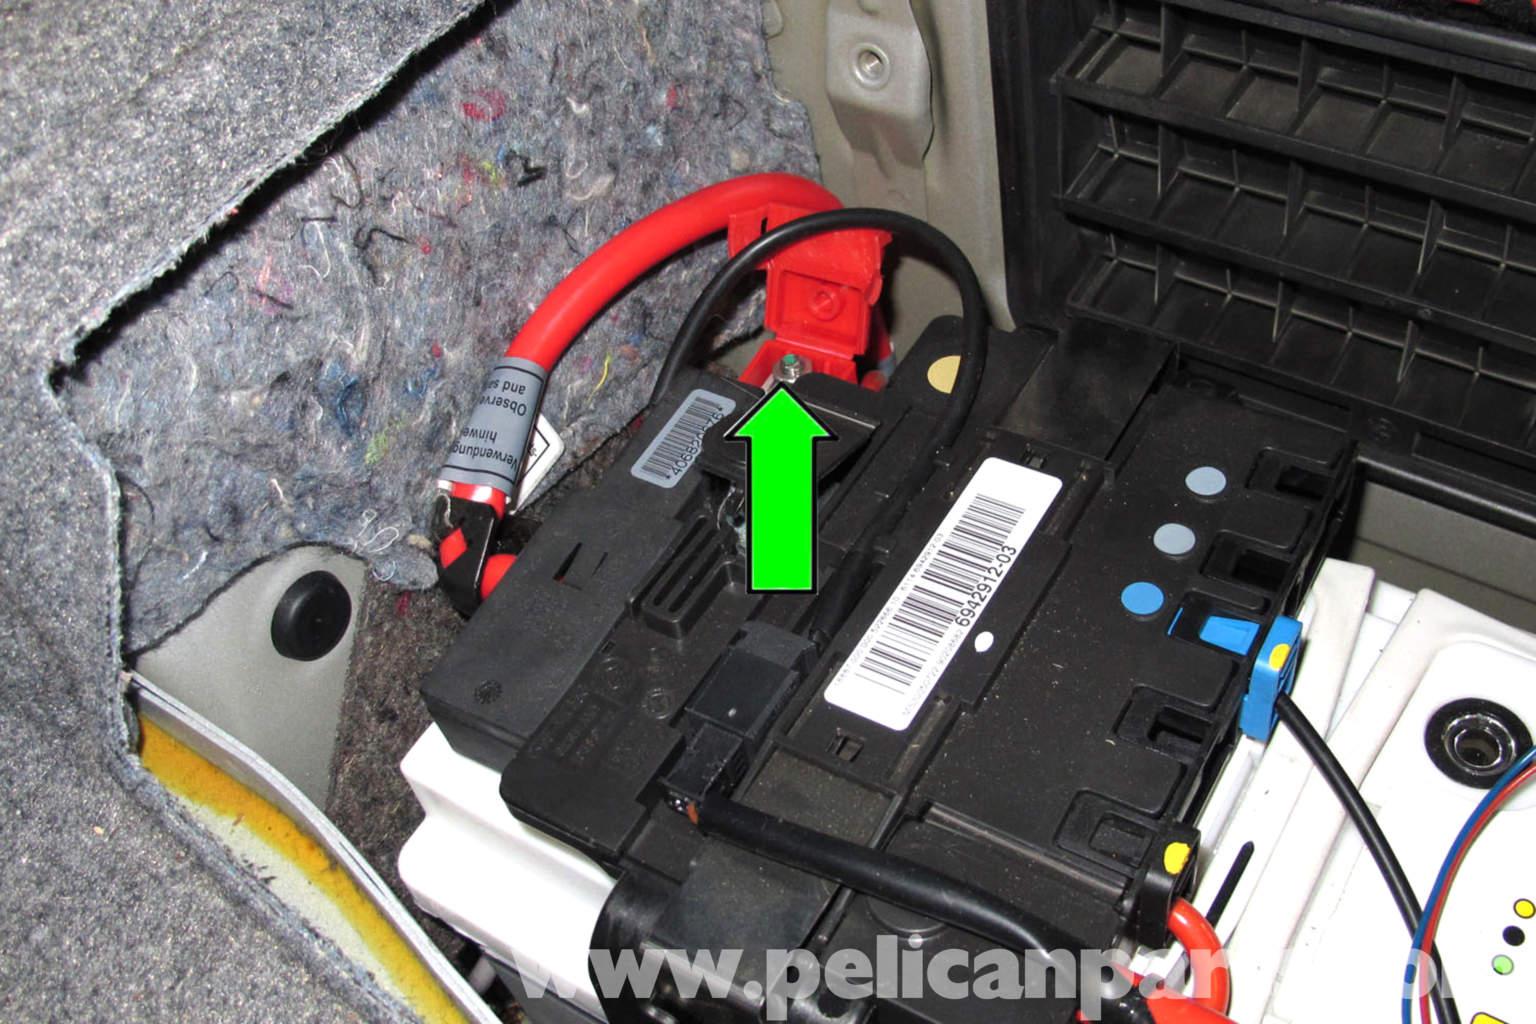 hight resolution of bmw e90 battery replacement e91 e92 e93 pelican 06 bmw e90 fuse diagram